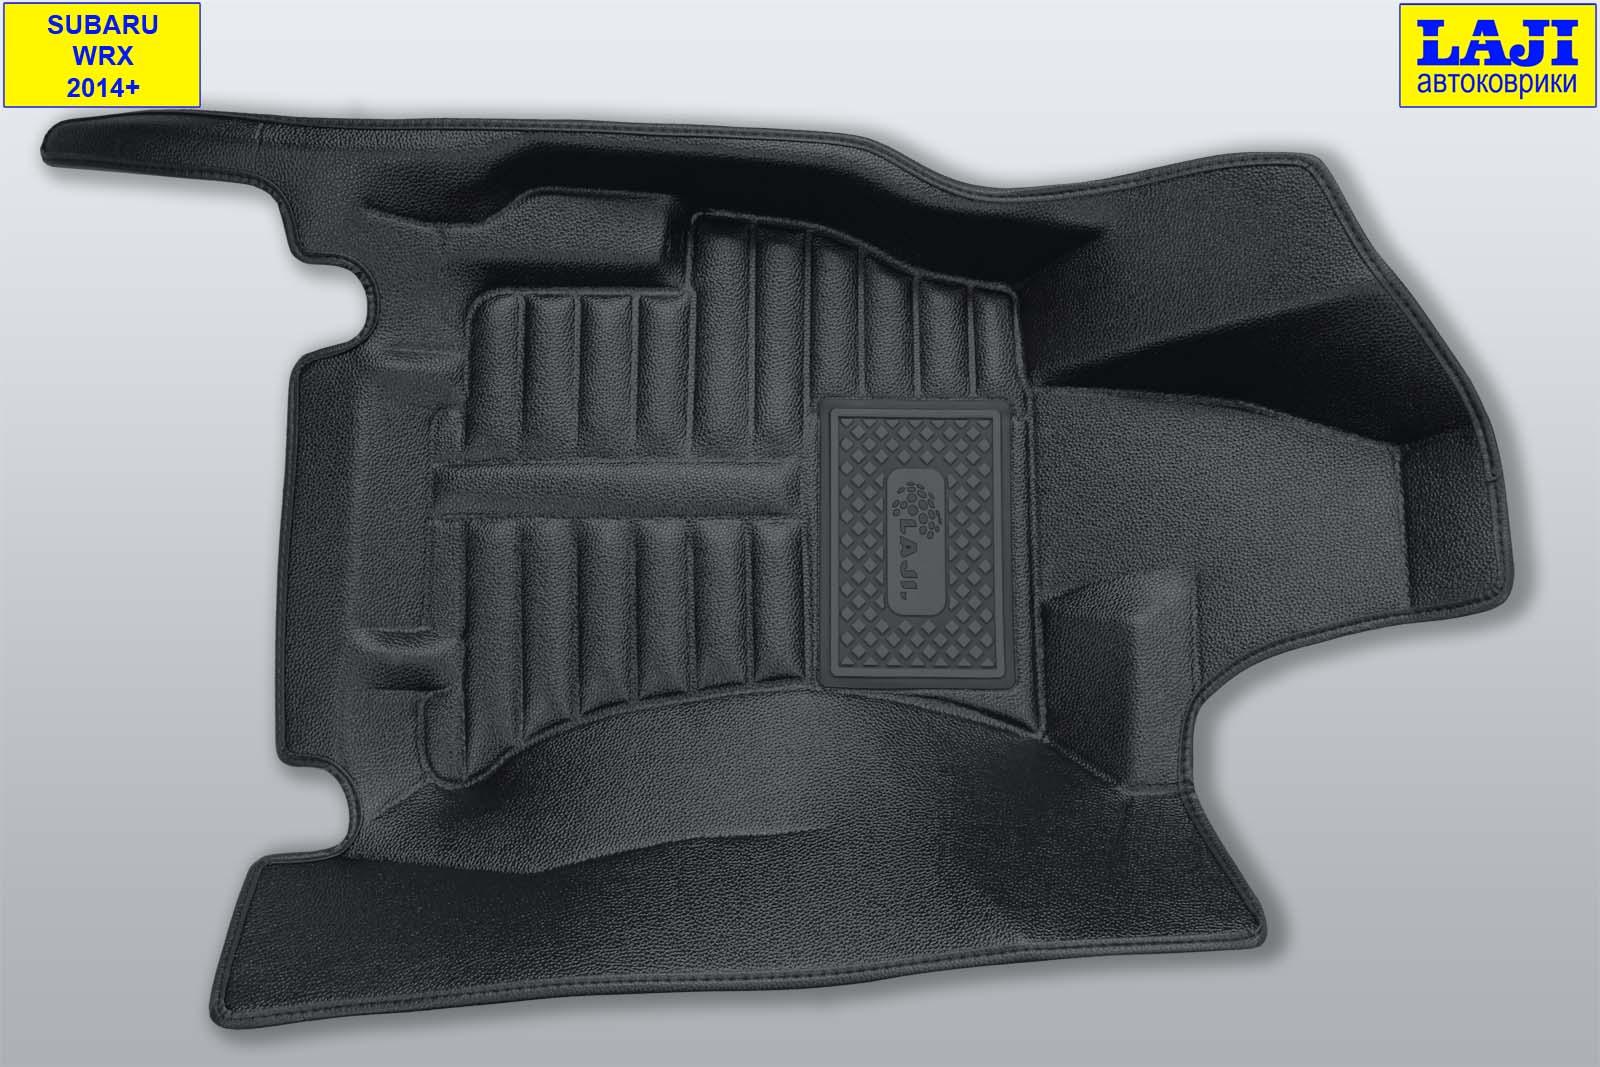 5D коврики в салон Subaru WRX 2014-н.в. 2